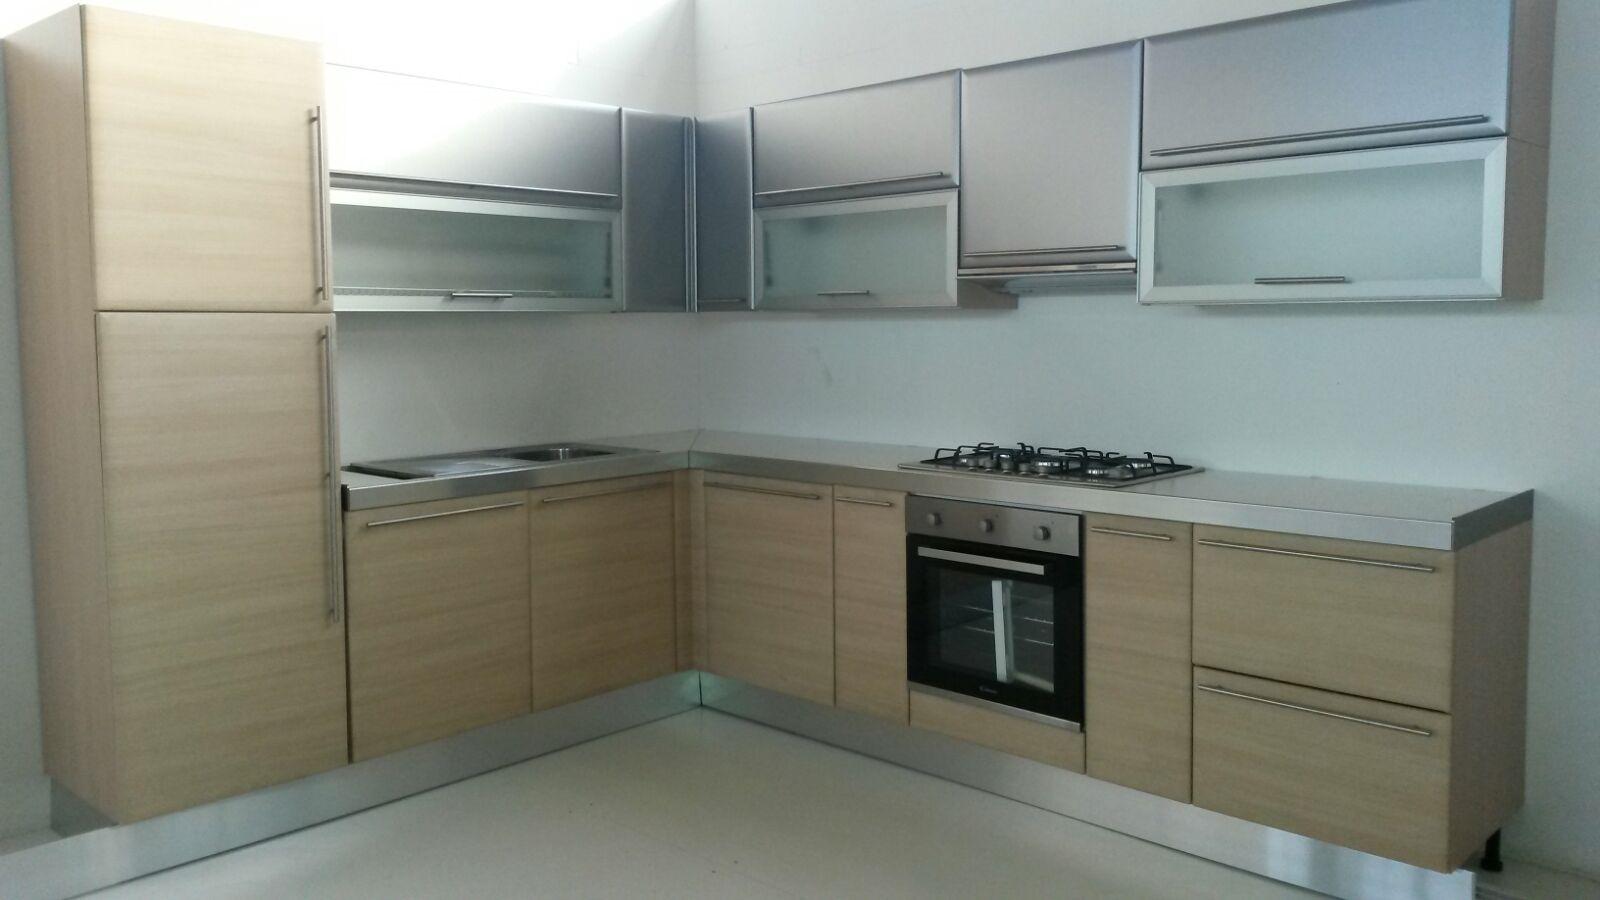 Cucine ad angolo moderne fq65 regardsdefemmes for Cucine moderne ad angolo